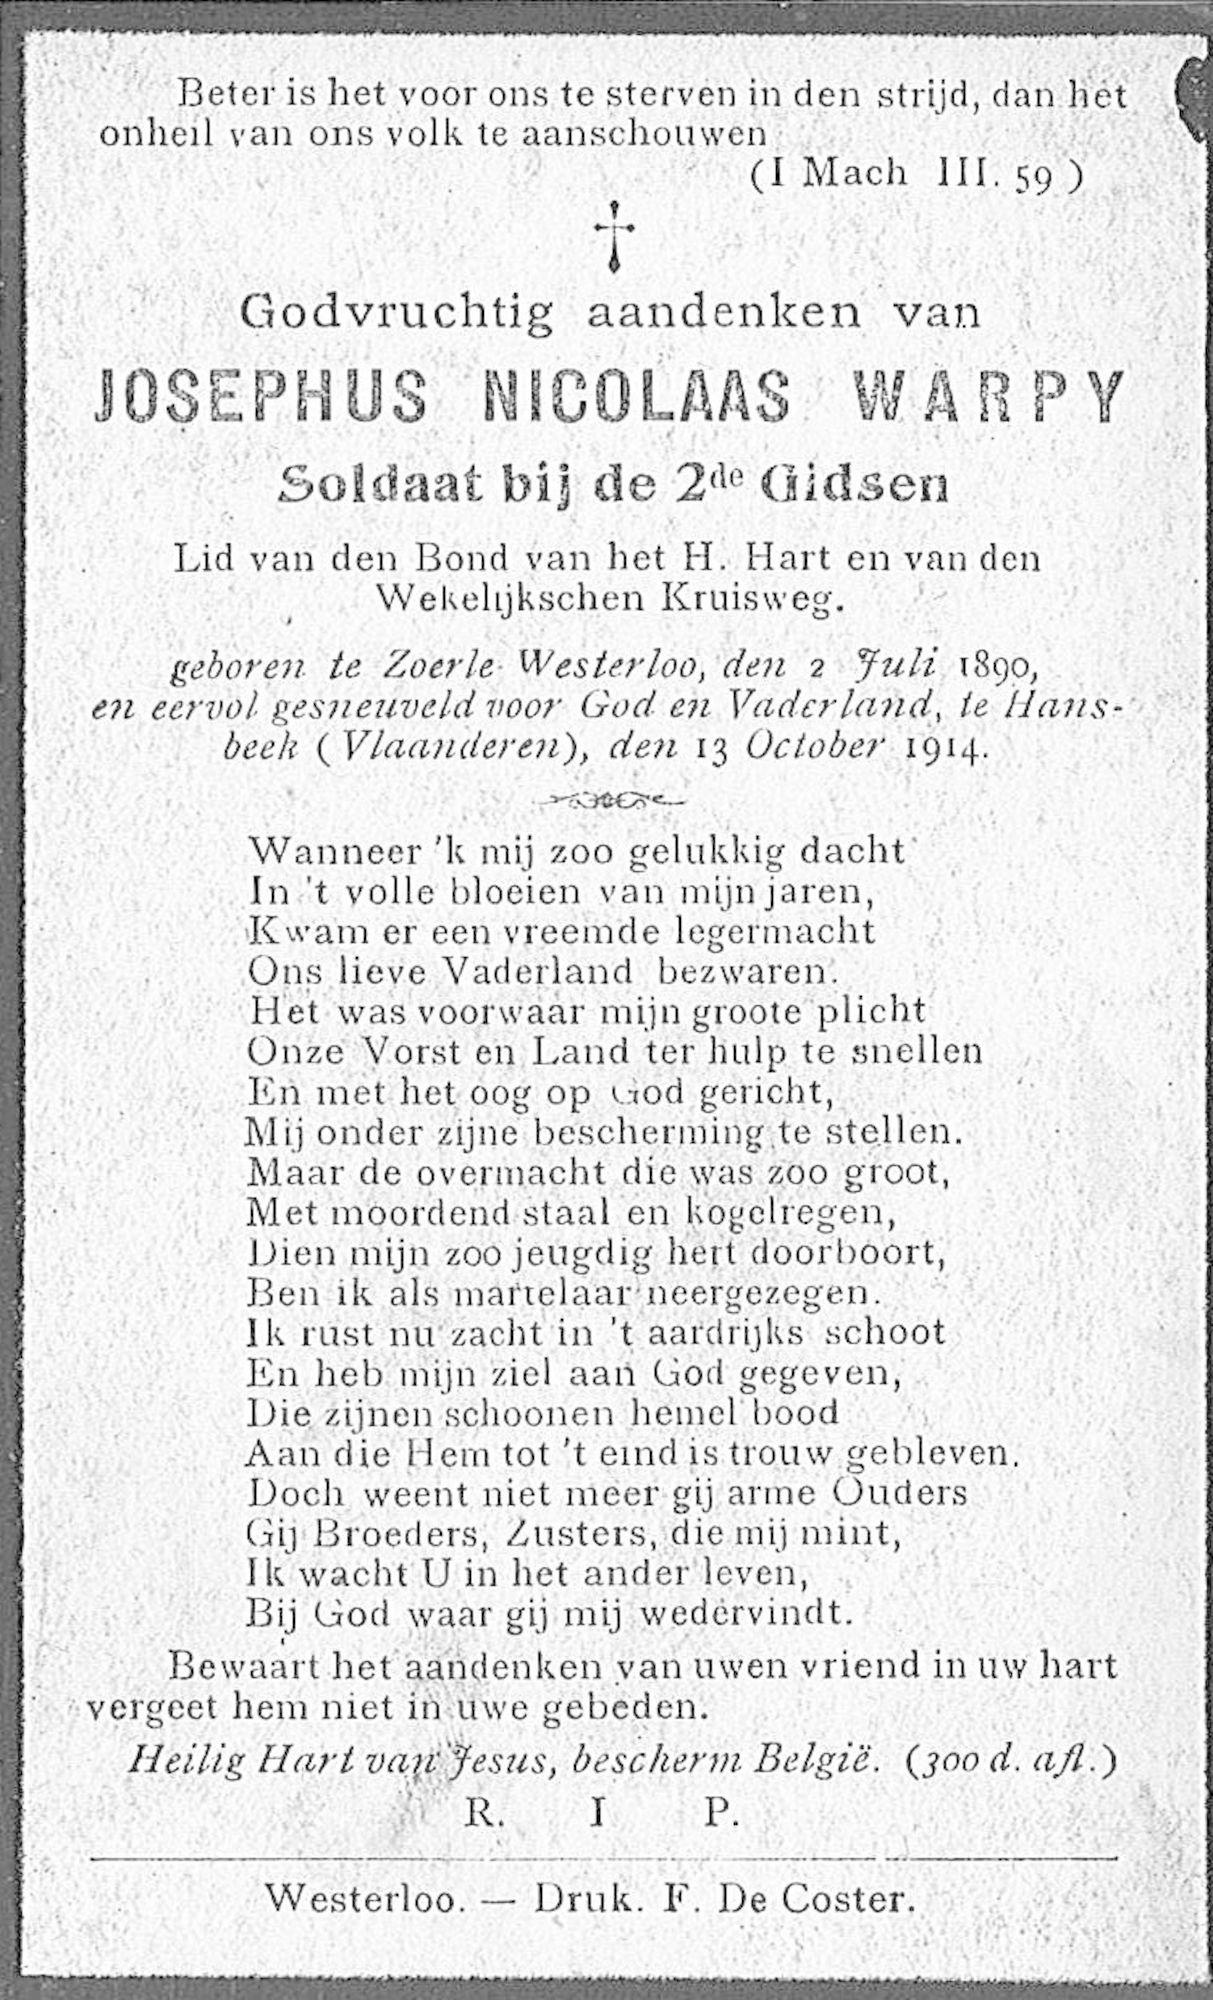 Josephus Nicolaas Warpy